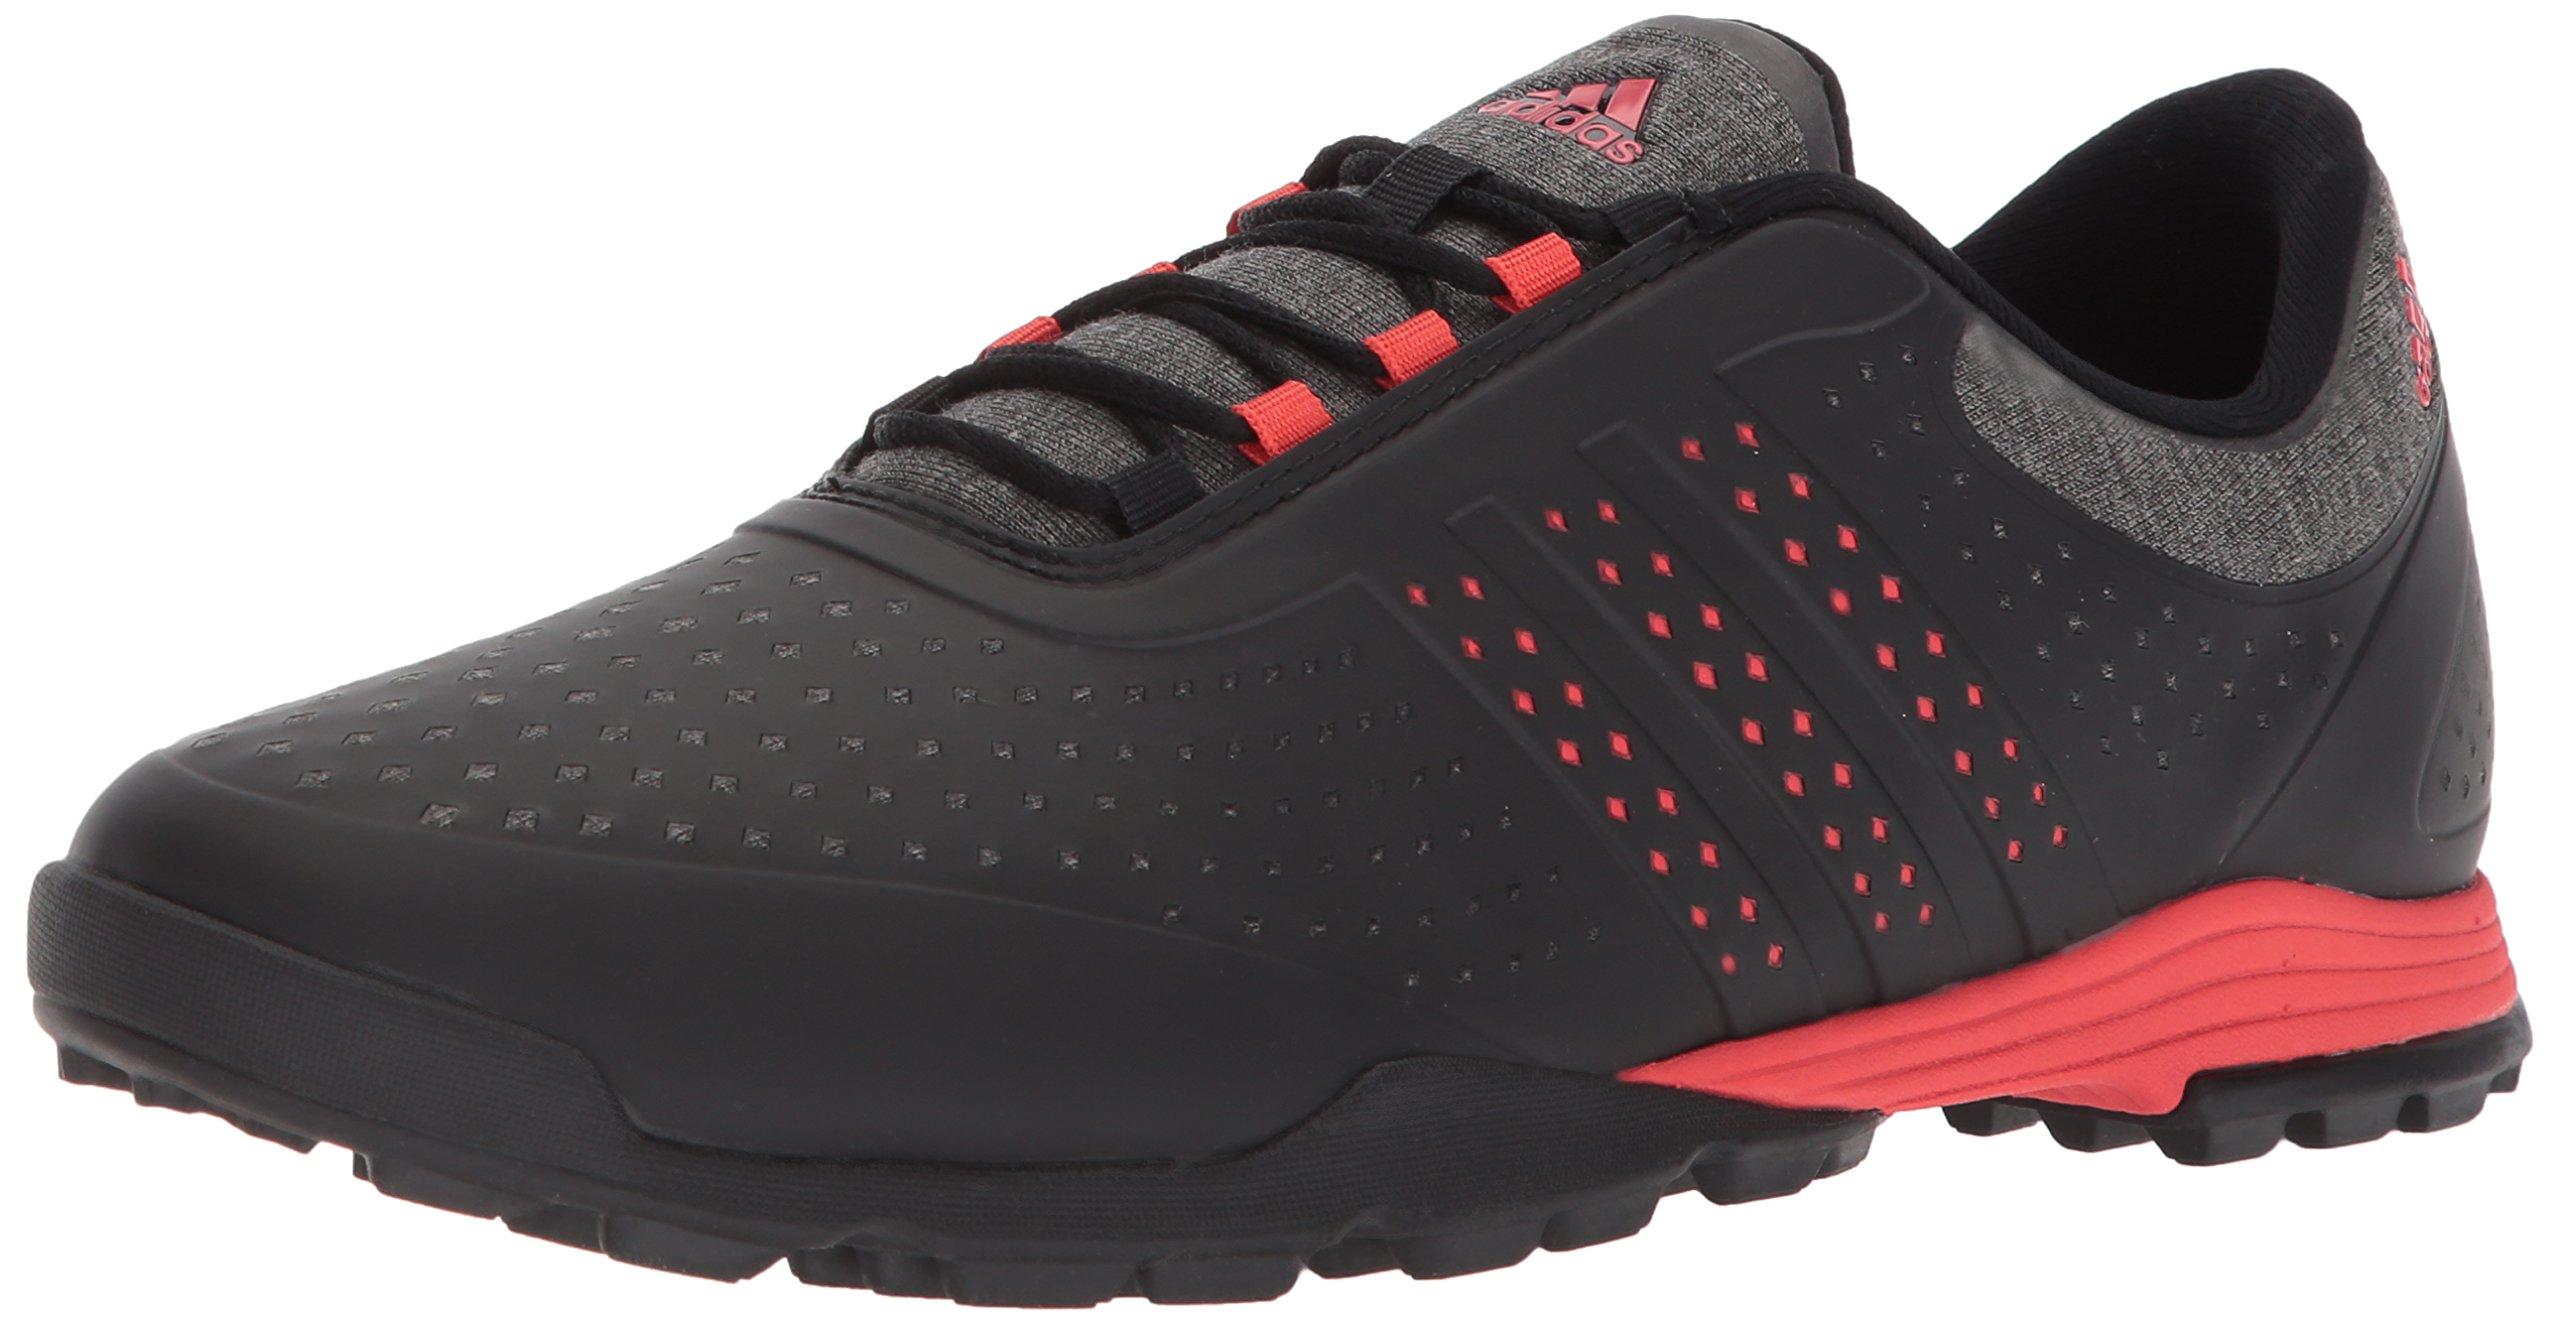 adidas Women's Adipure Sport Golf Shoe, Core Black/Real Coral, 9.5 Medium US by adidas